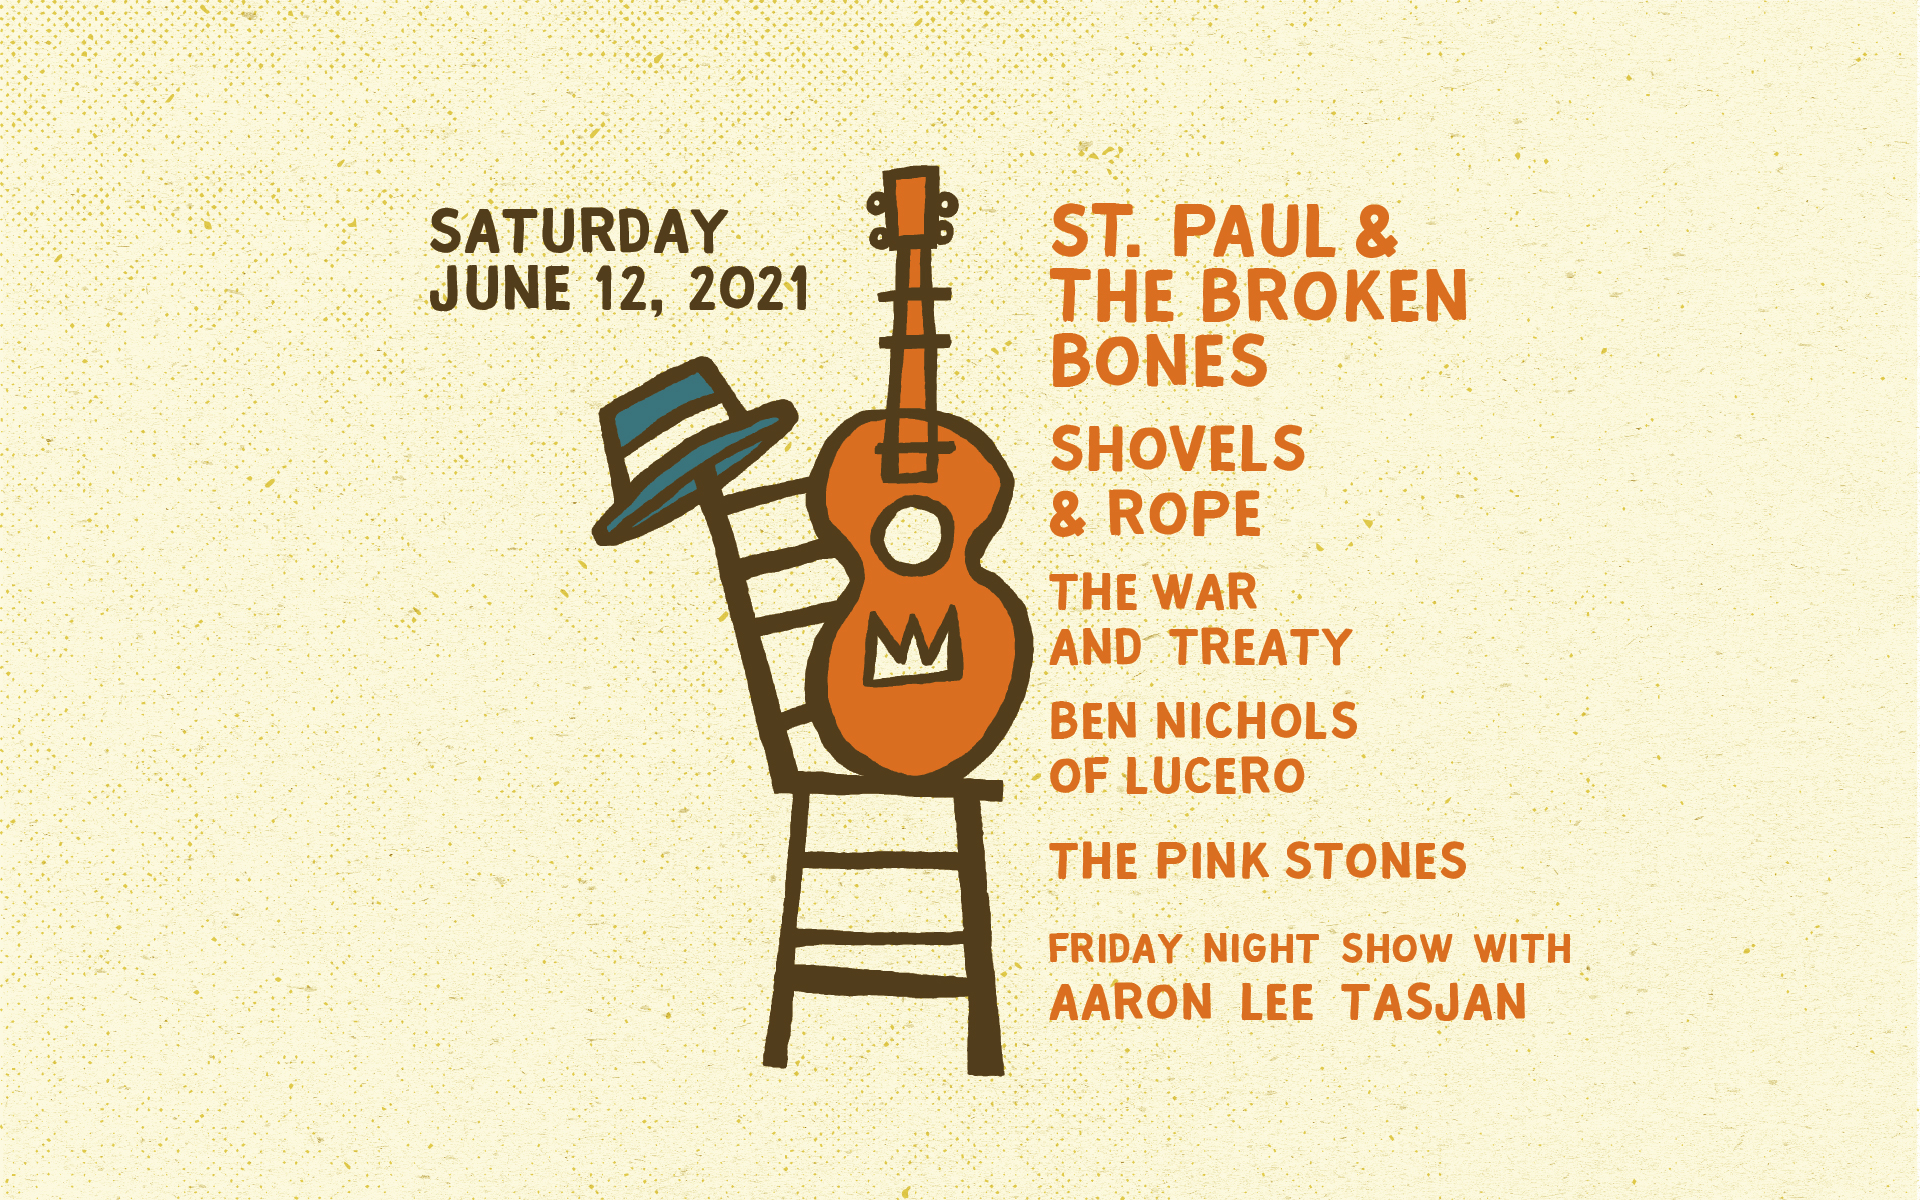 Saturday, June 12, 2021 St. Paul & The Broken Bones, Shovels & Rope, Ben Nichols of Lucero, The Pink Stones, and Friday Night Show with Aaron Lee Tasjan